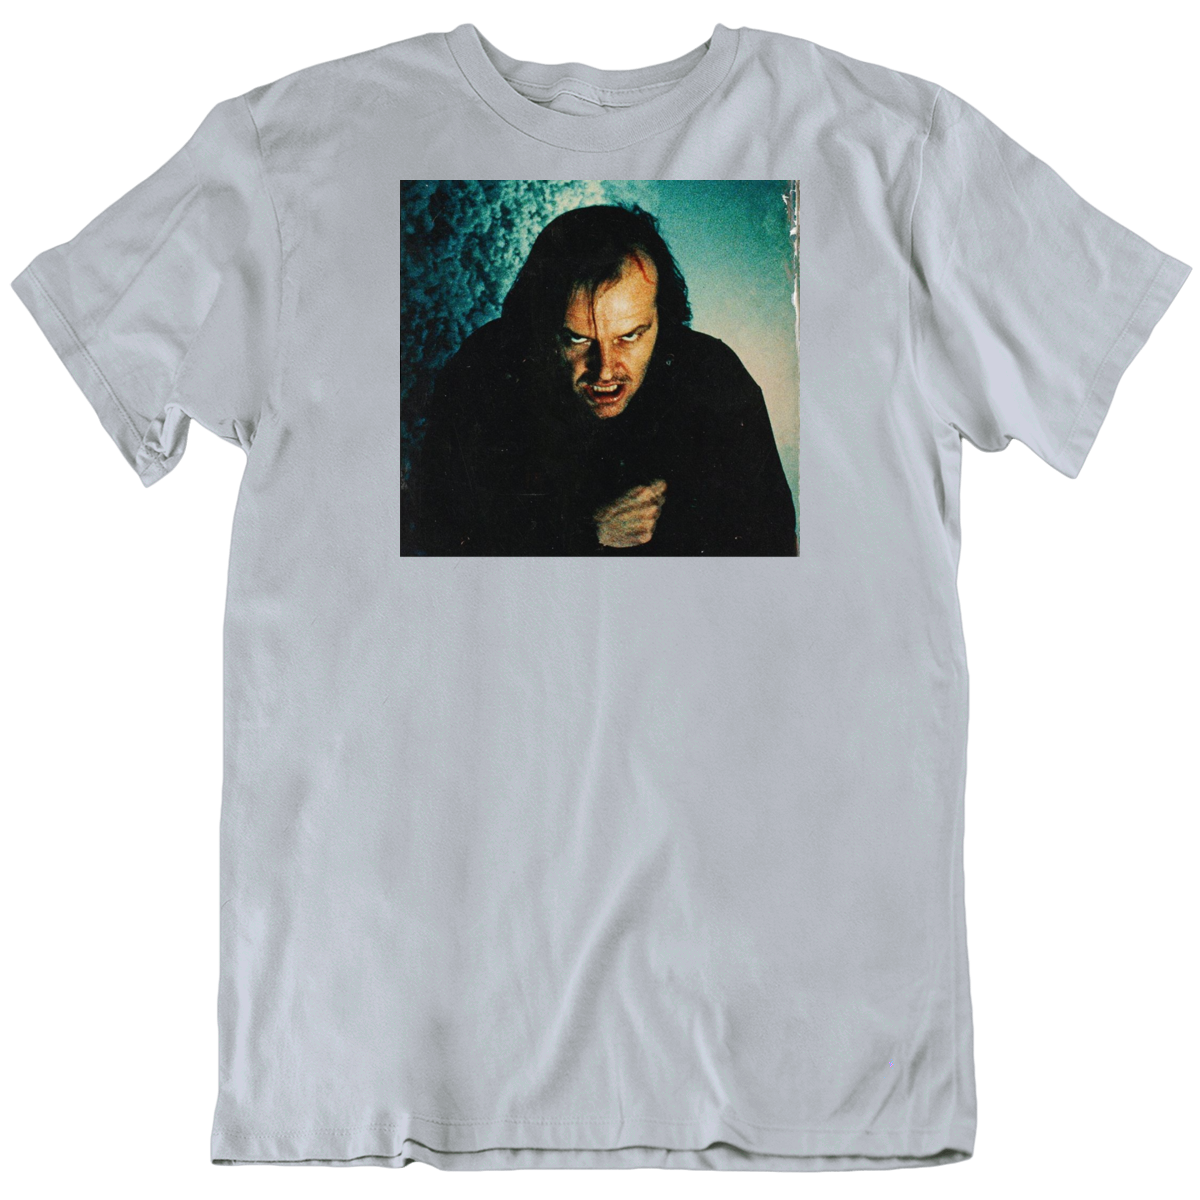 Retro Classic Horror The Shining Jack Torrance Maze Movie Fan  T Shirt